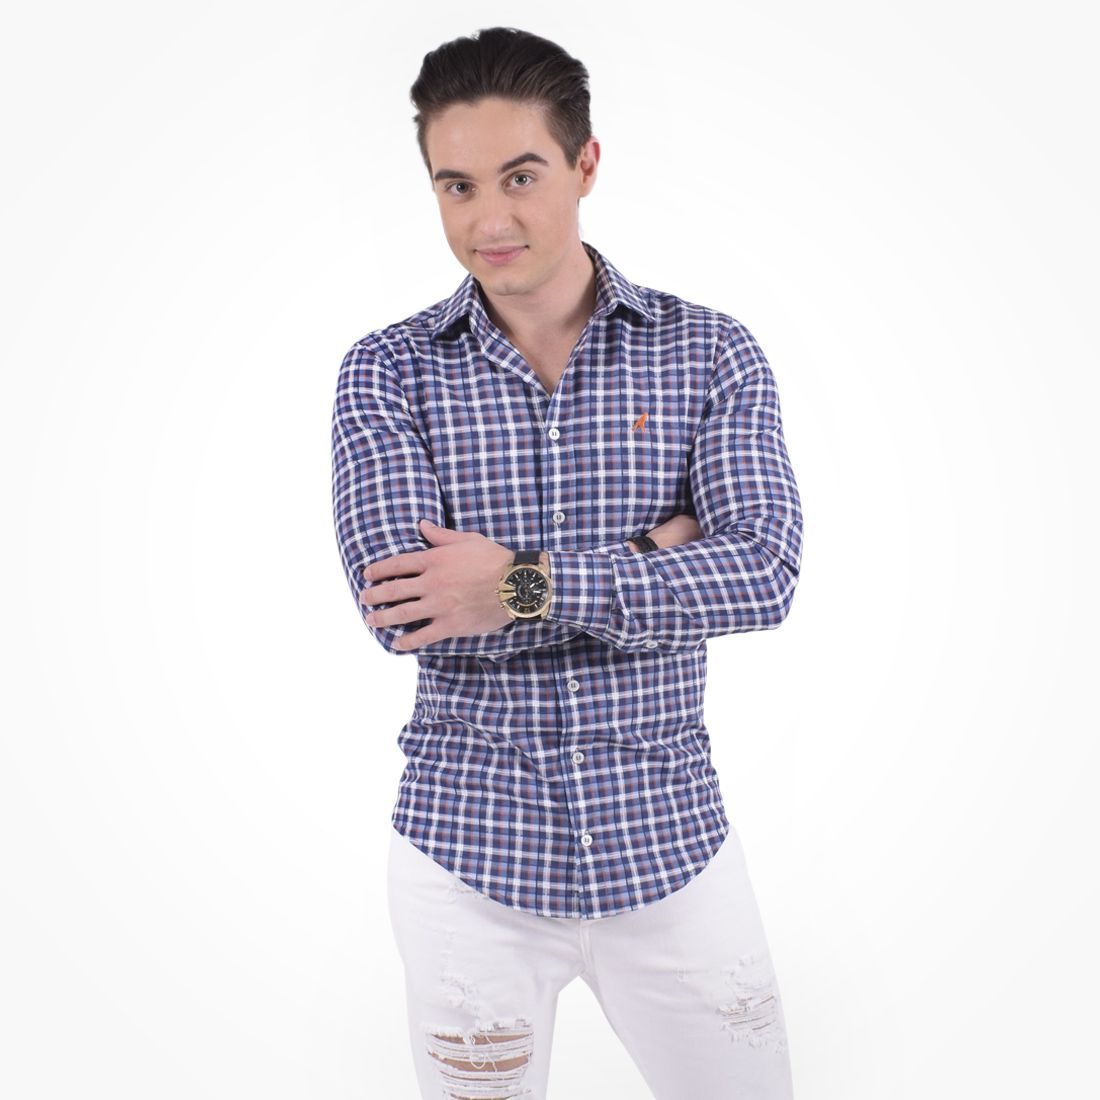 100231 - Camisa Xadrez Masculina Slim Social Estampada Azul - LEVOK